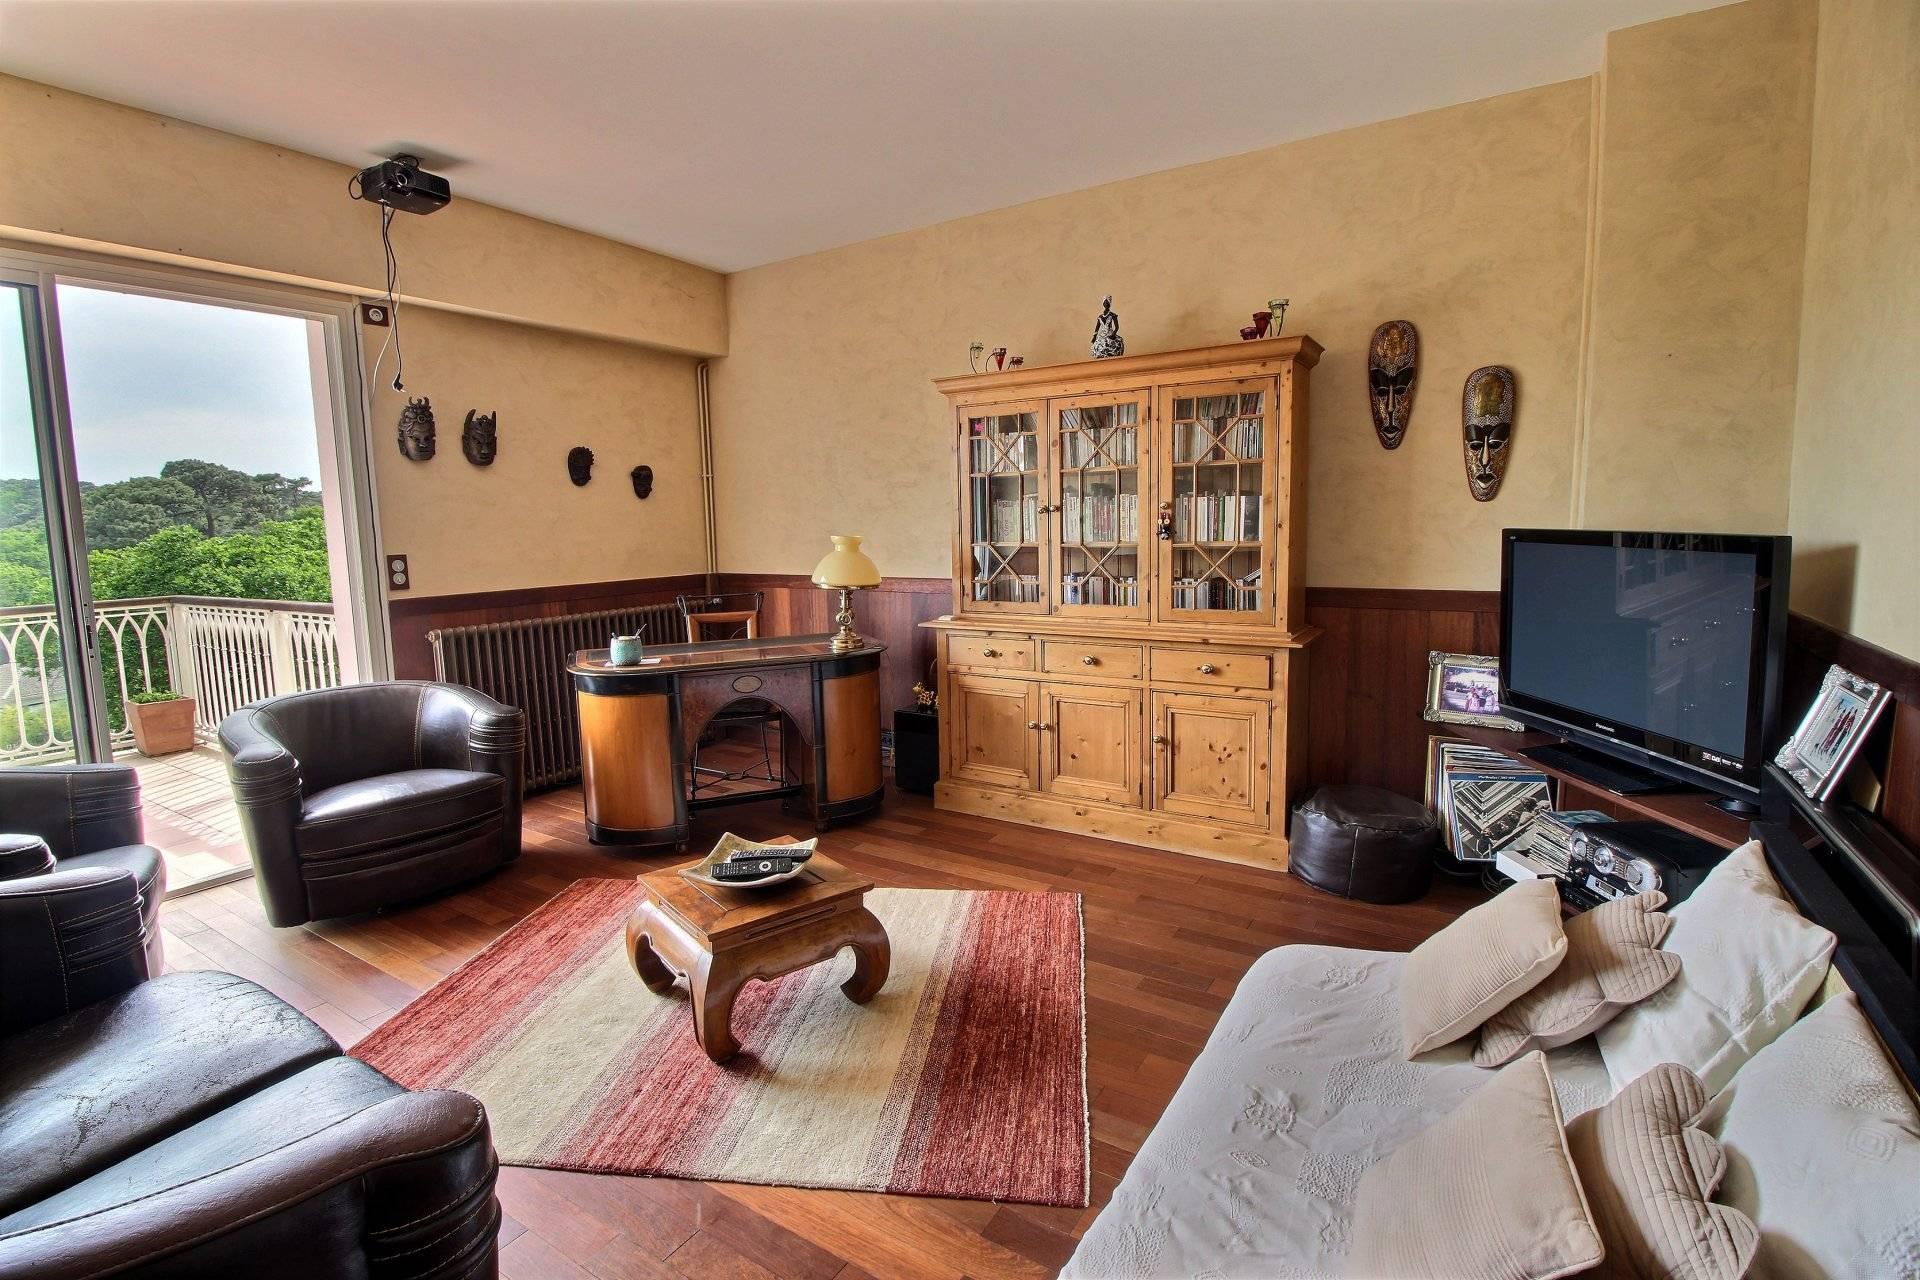 Recherche villa de luxe avec vue panoramique quartier Pereire ARCACHON